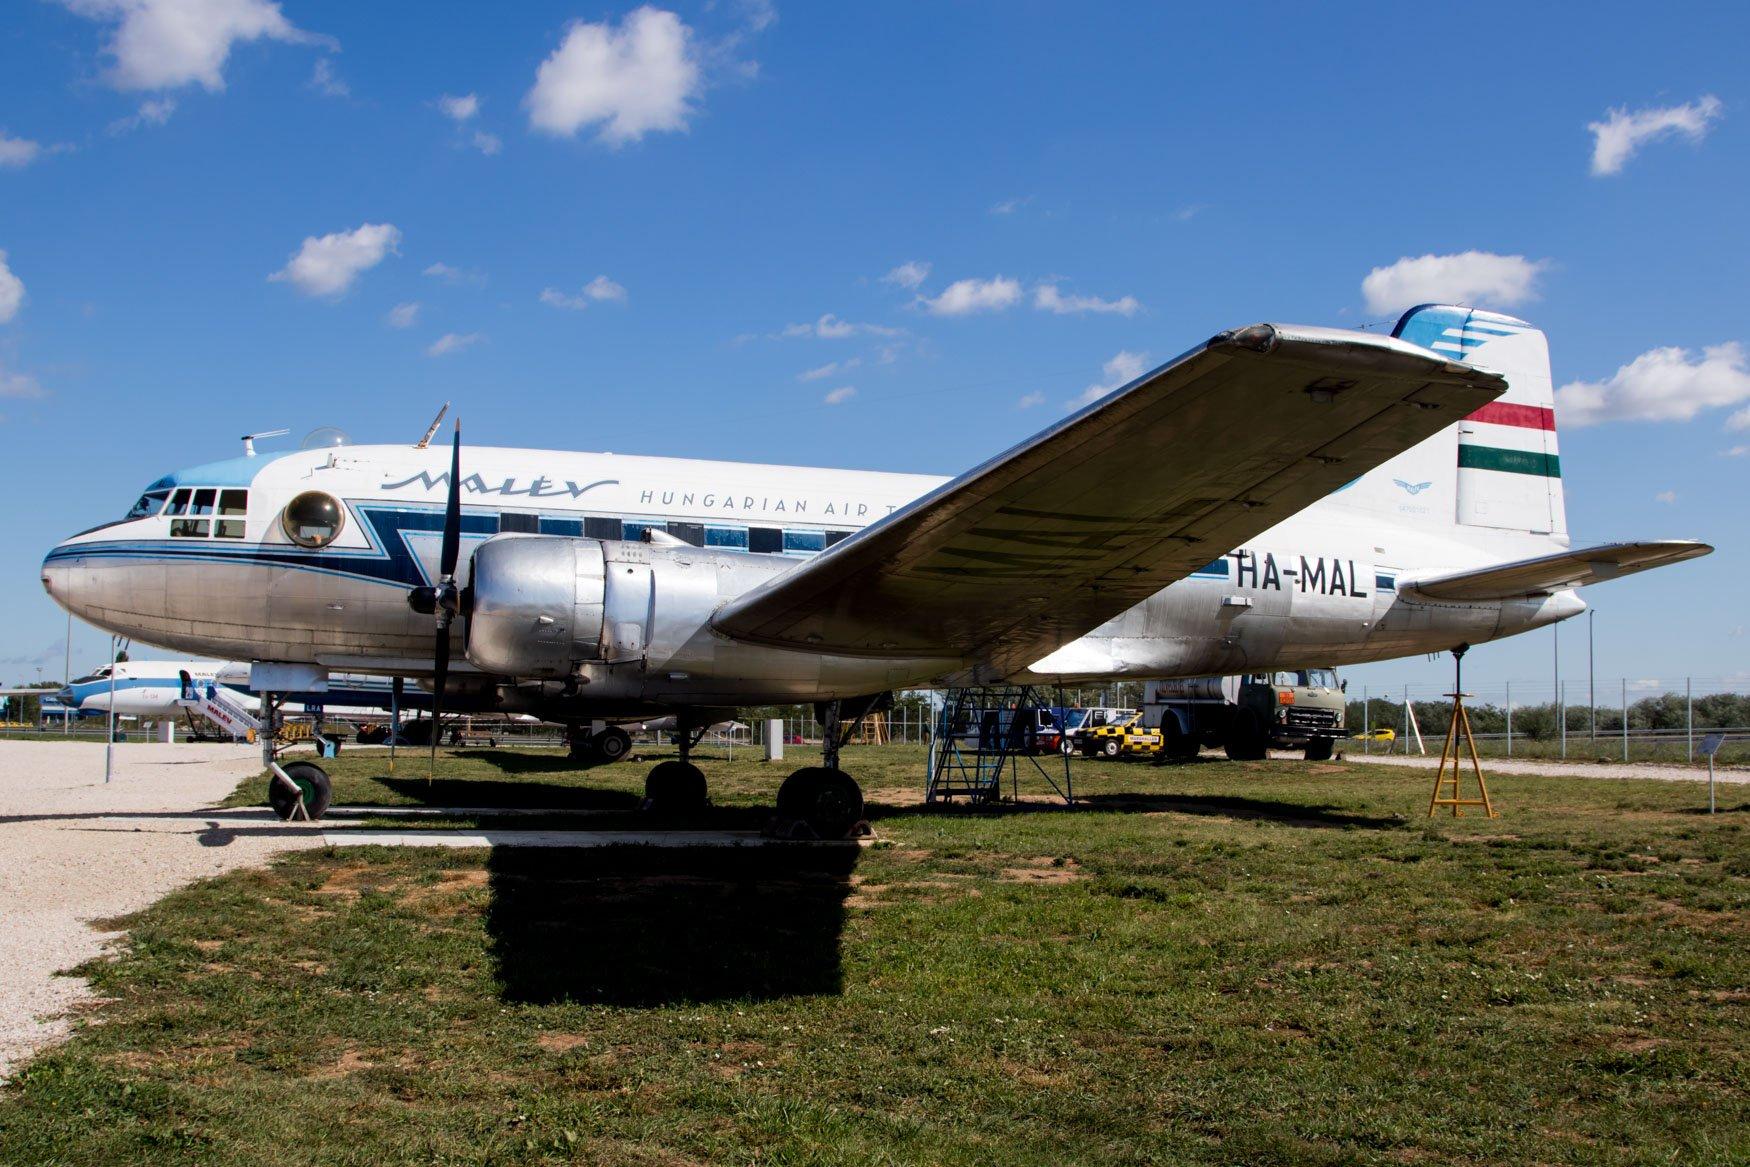 Malev Il-14